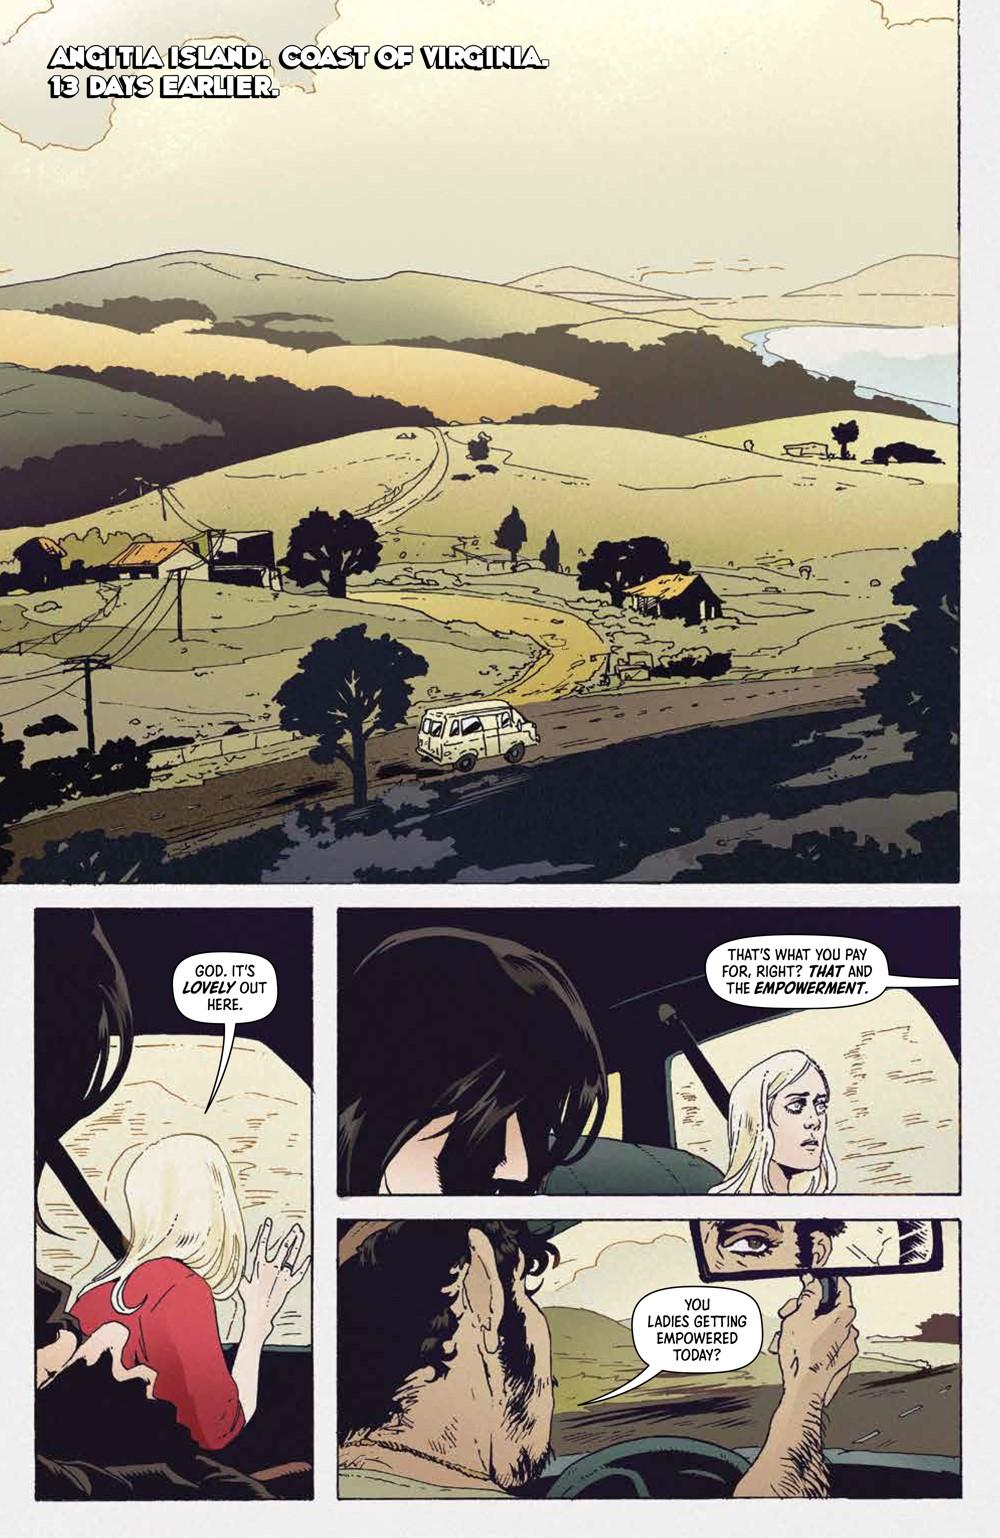 Maw_001_PRESS_4 ComicList Previews: MAW #1 (OF 5)